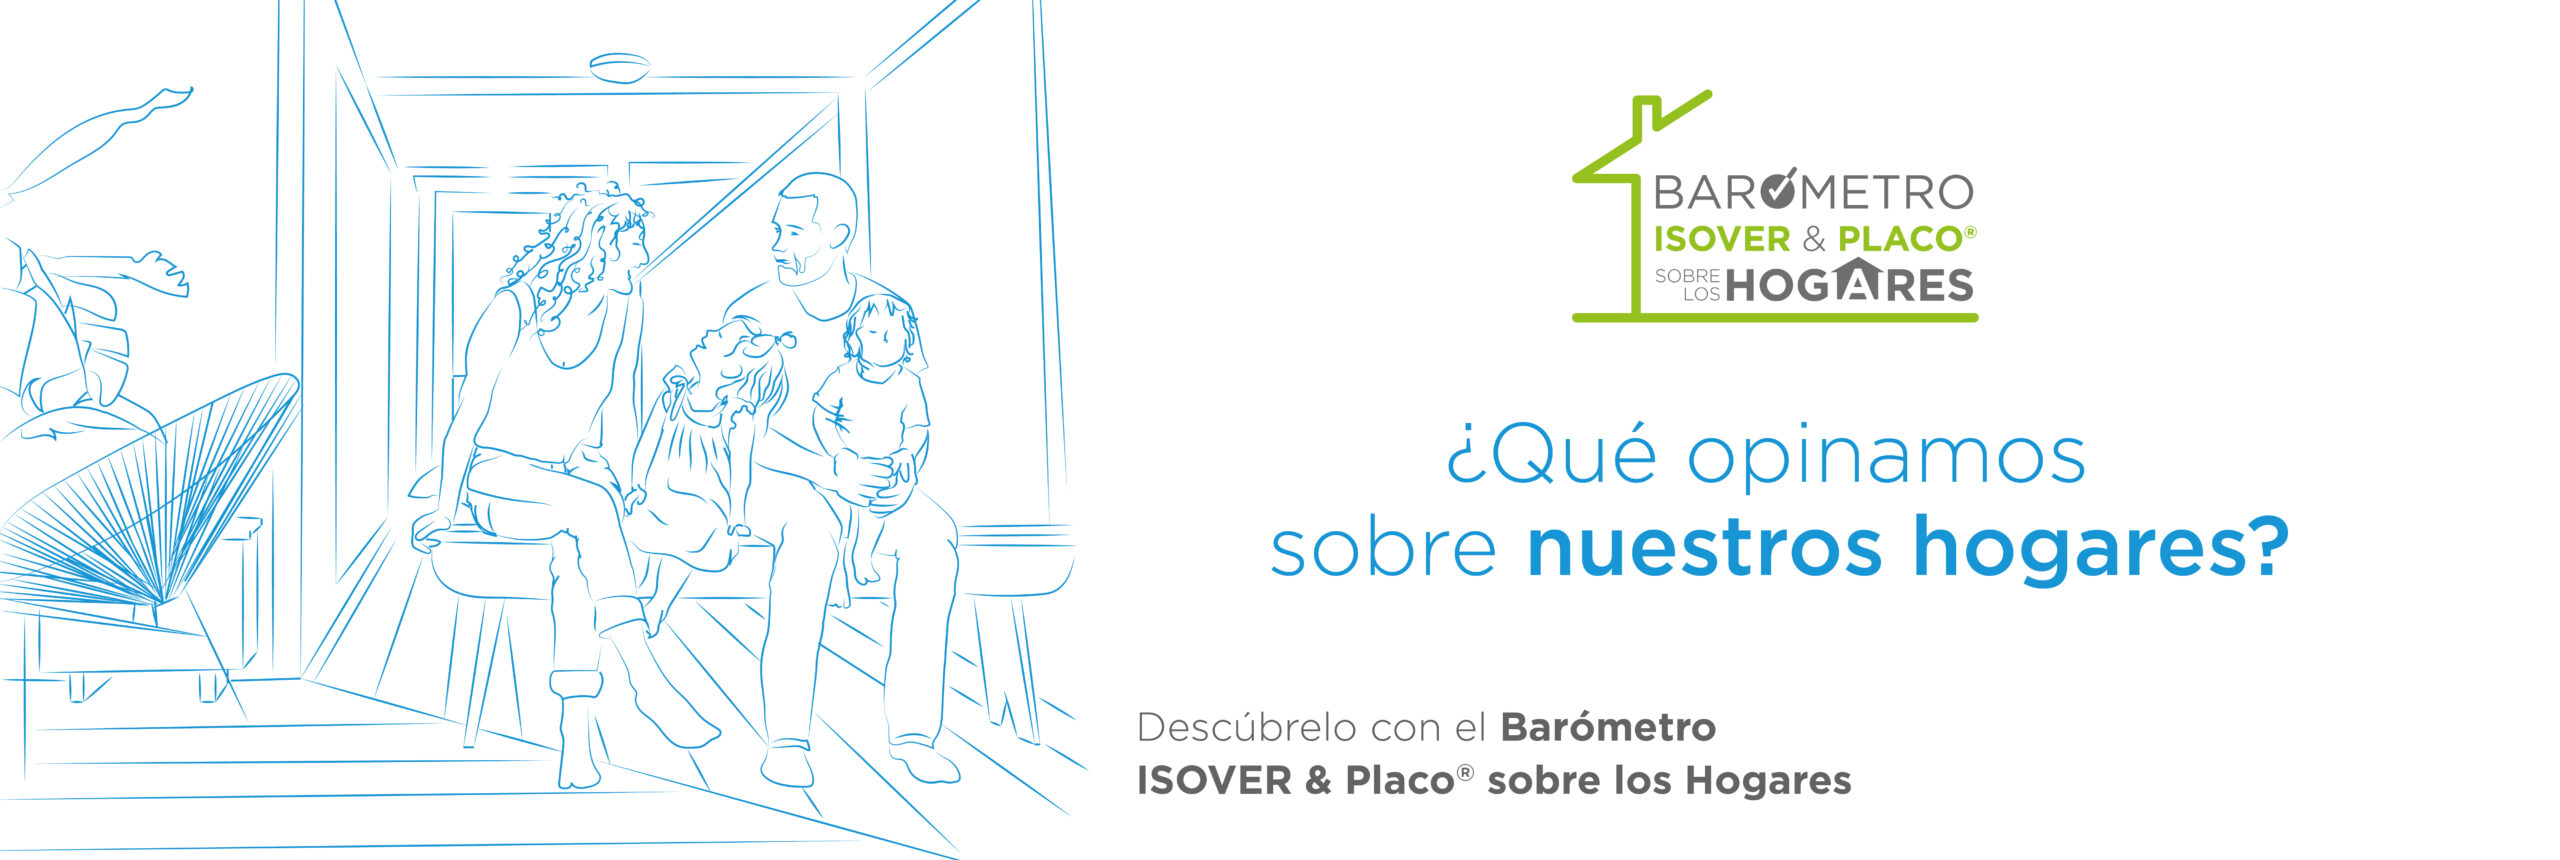 01_banner_barometro